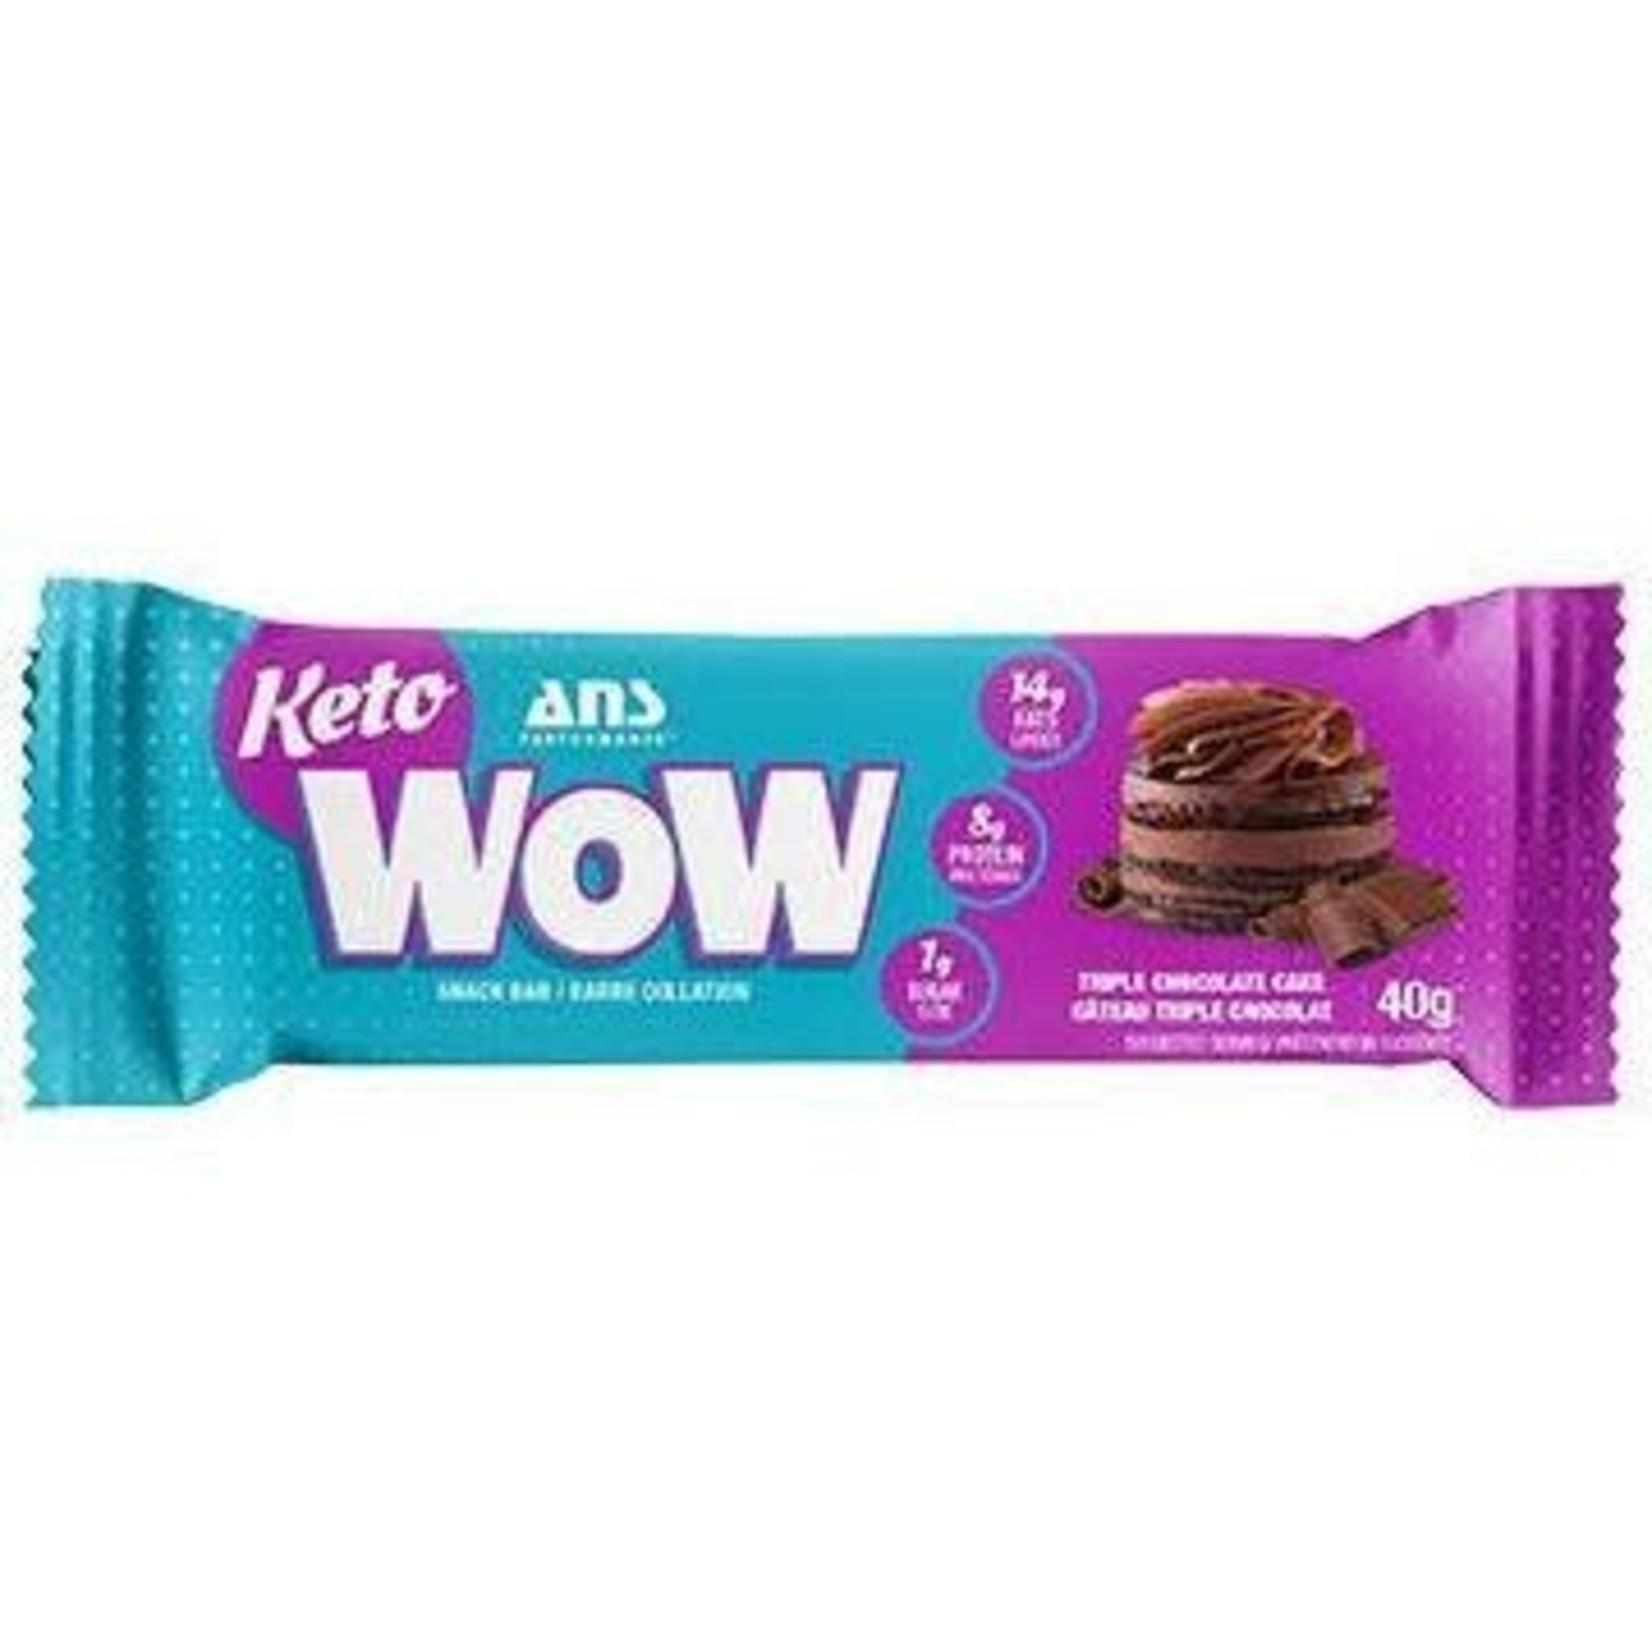 ANS ANS Keto WOW Triple Chocolate Cake Bar